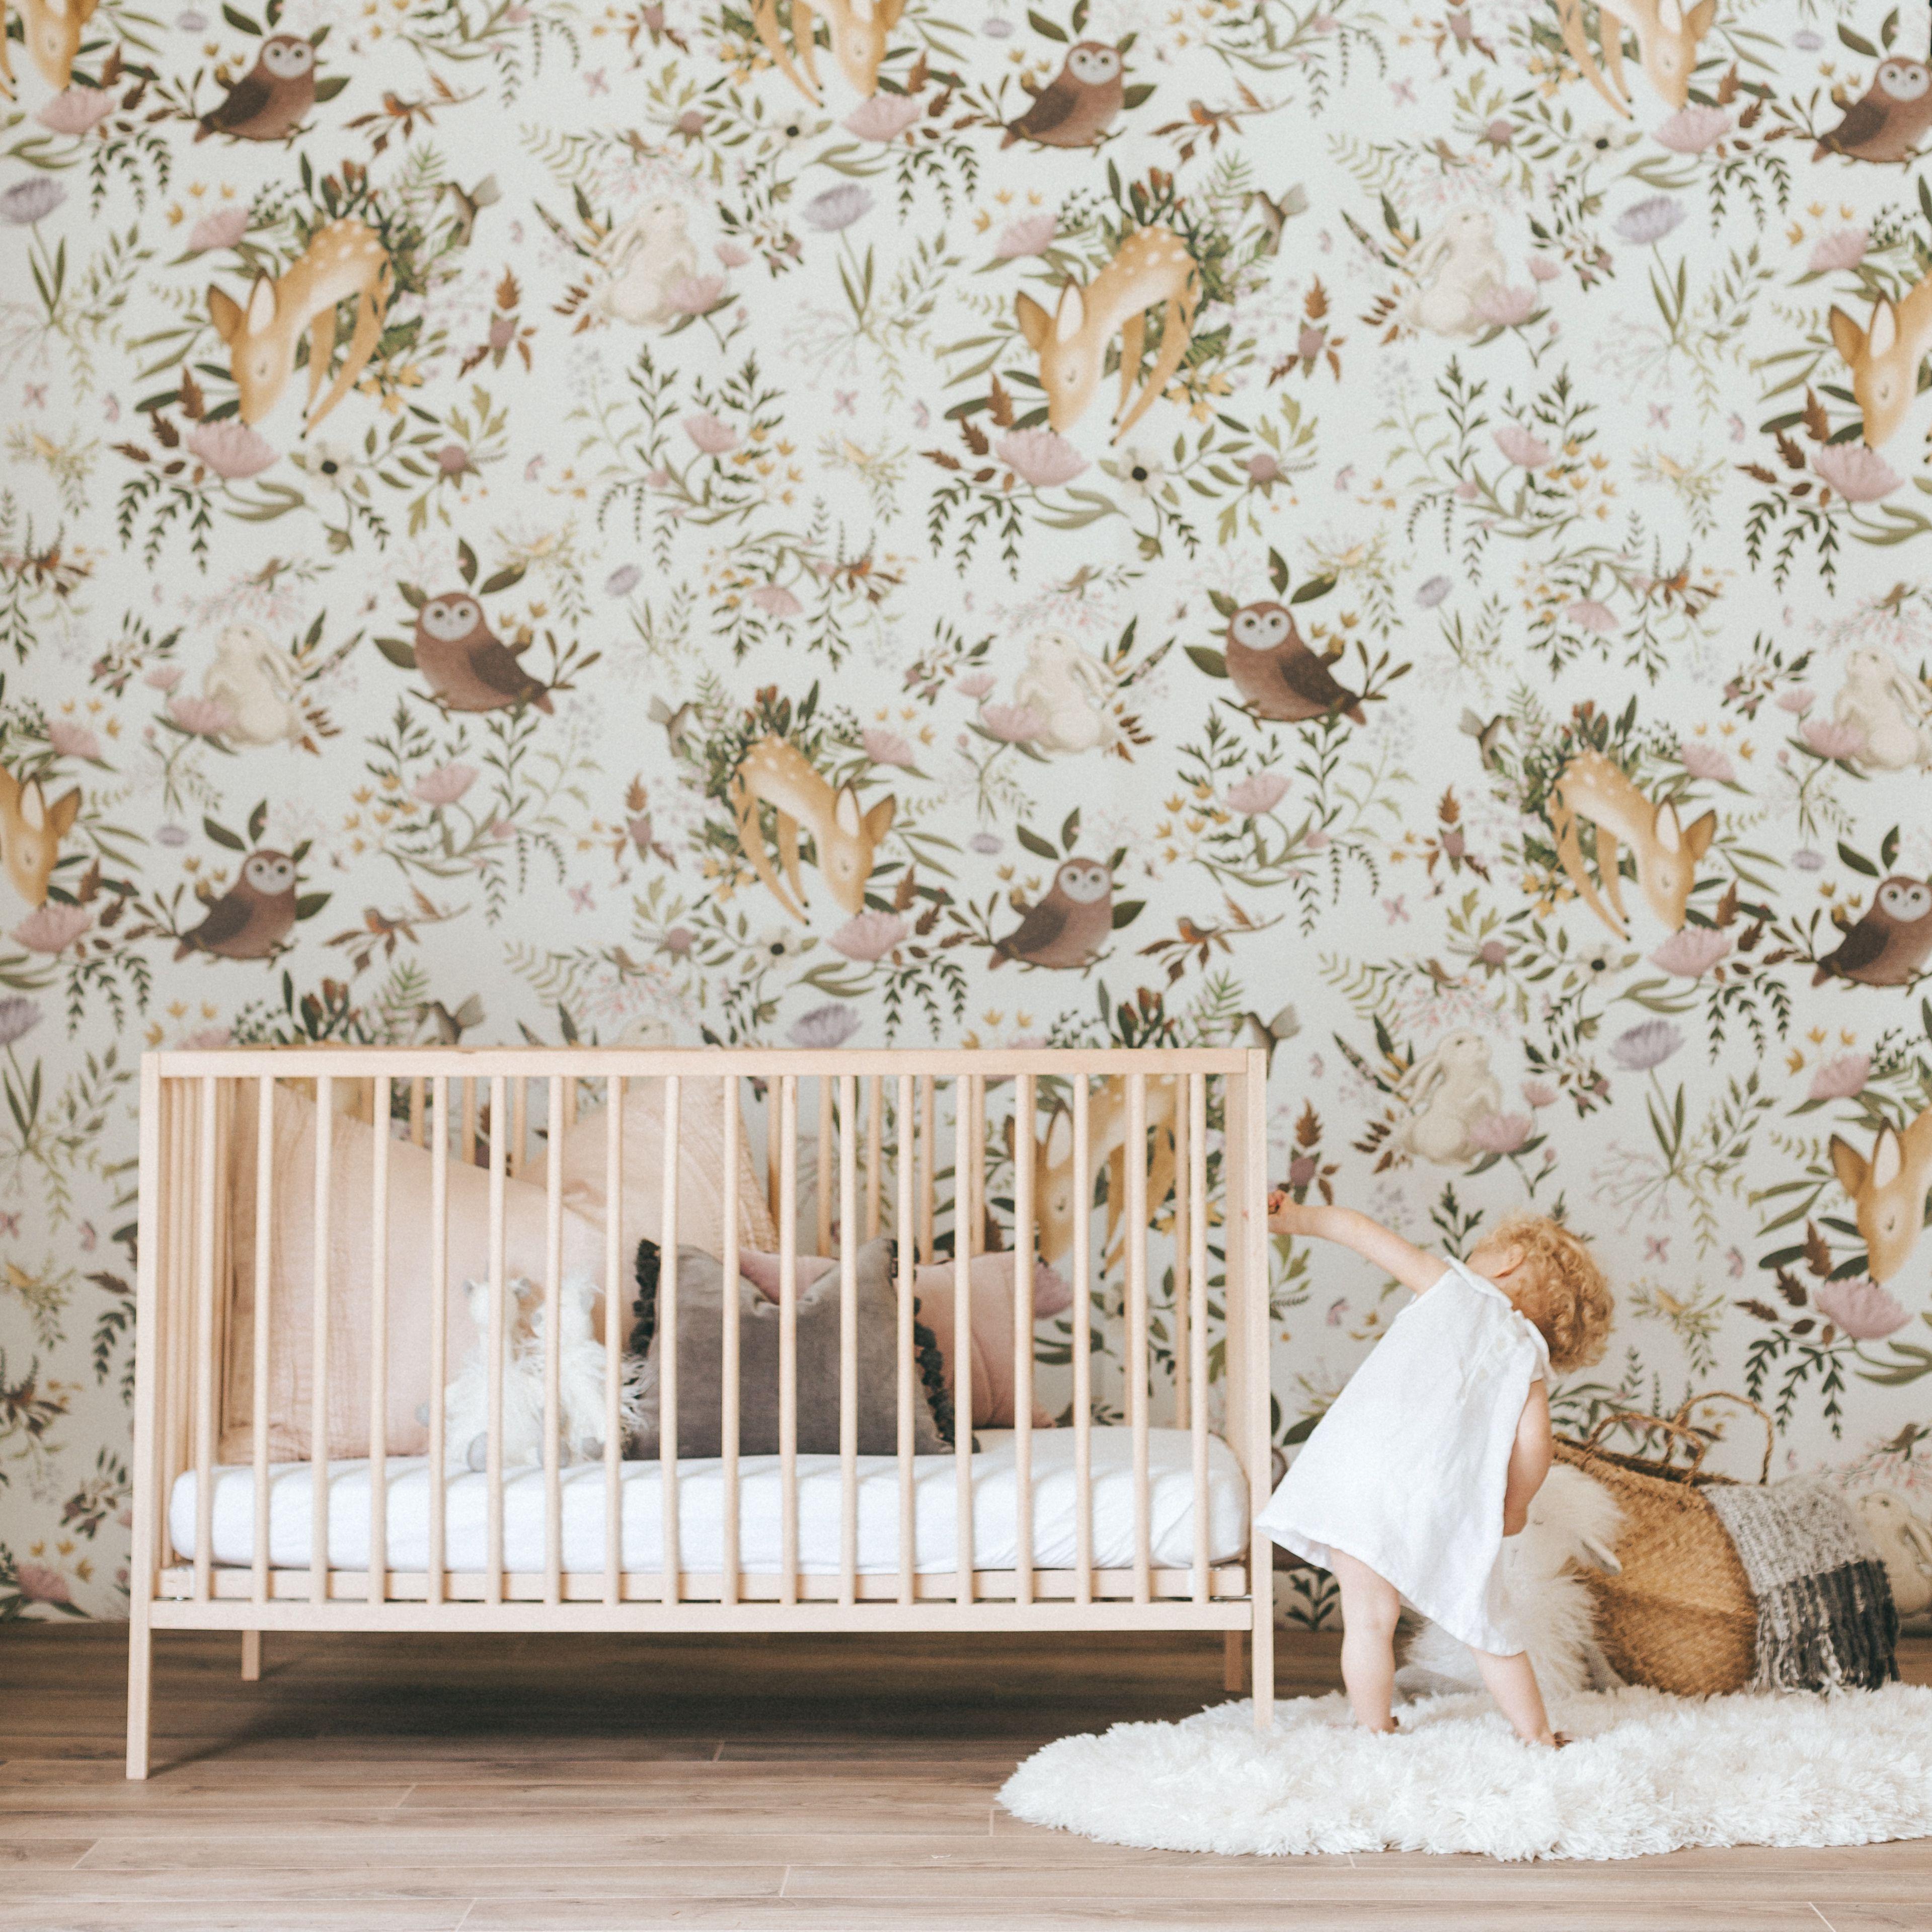 Anewall OH Deer Wallpaper Mural, Light Nursery wallpaper